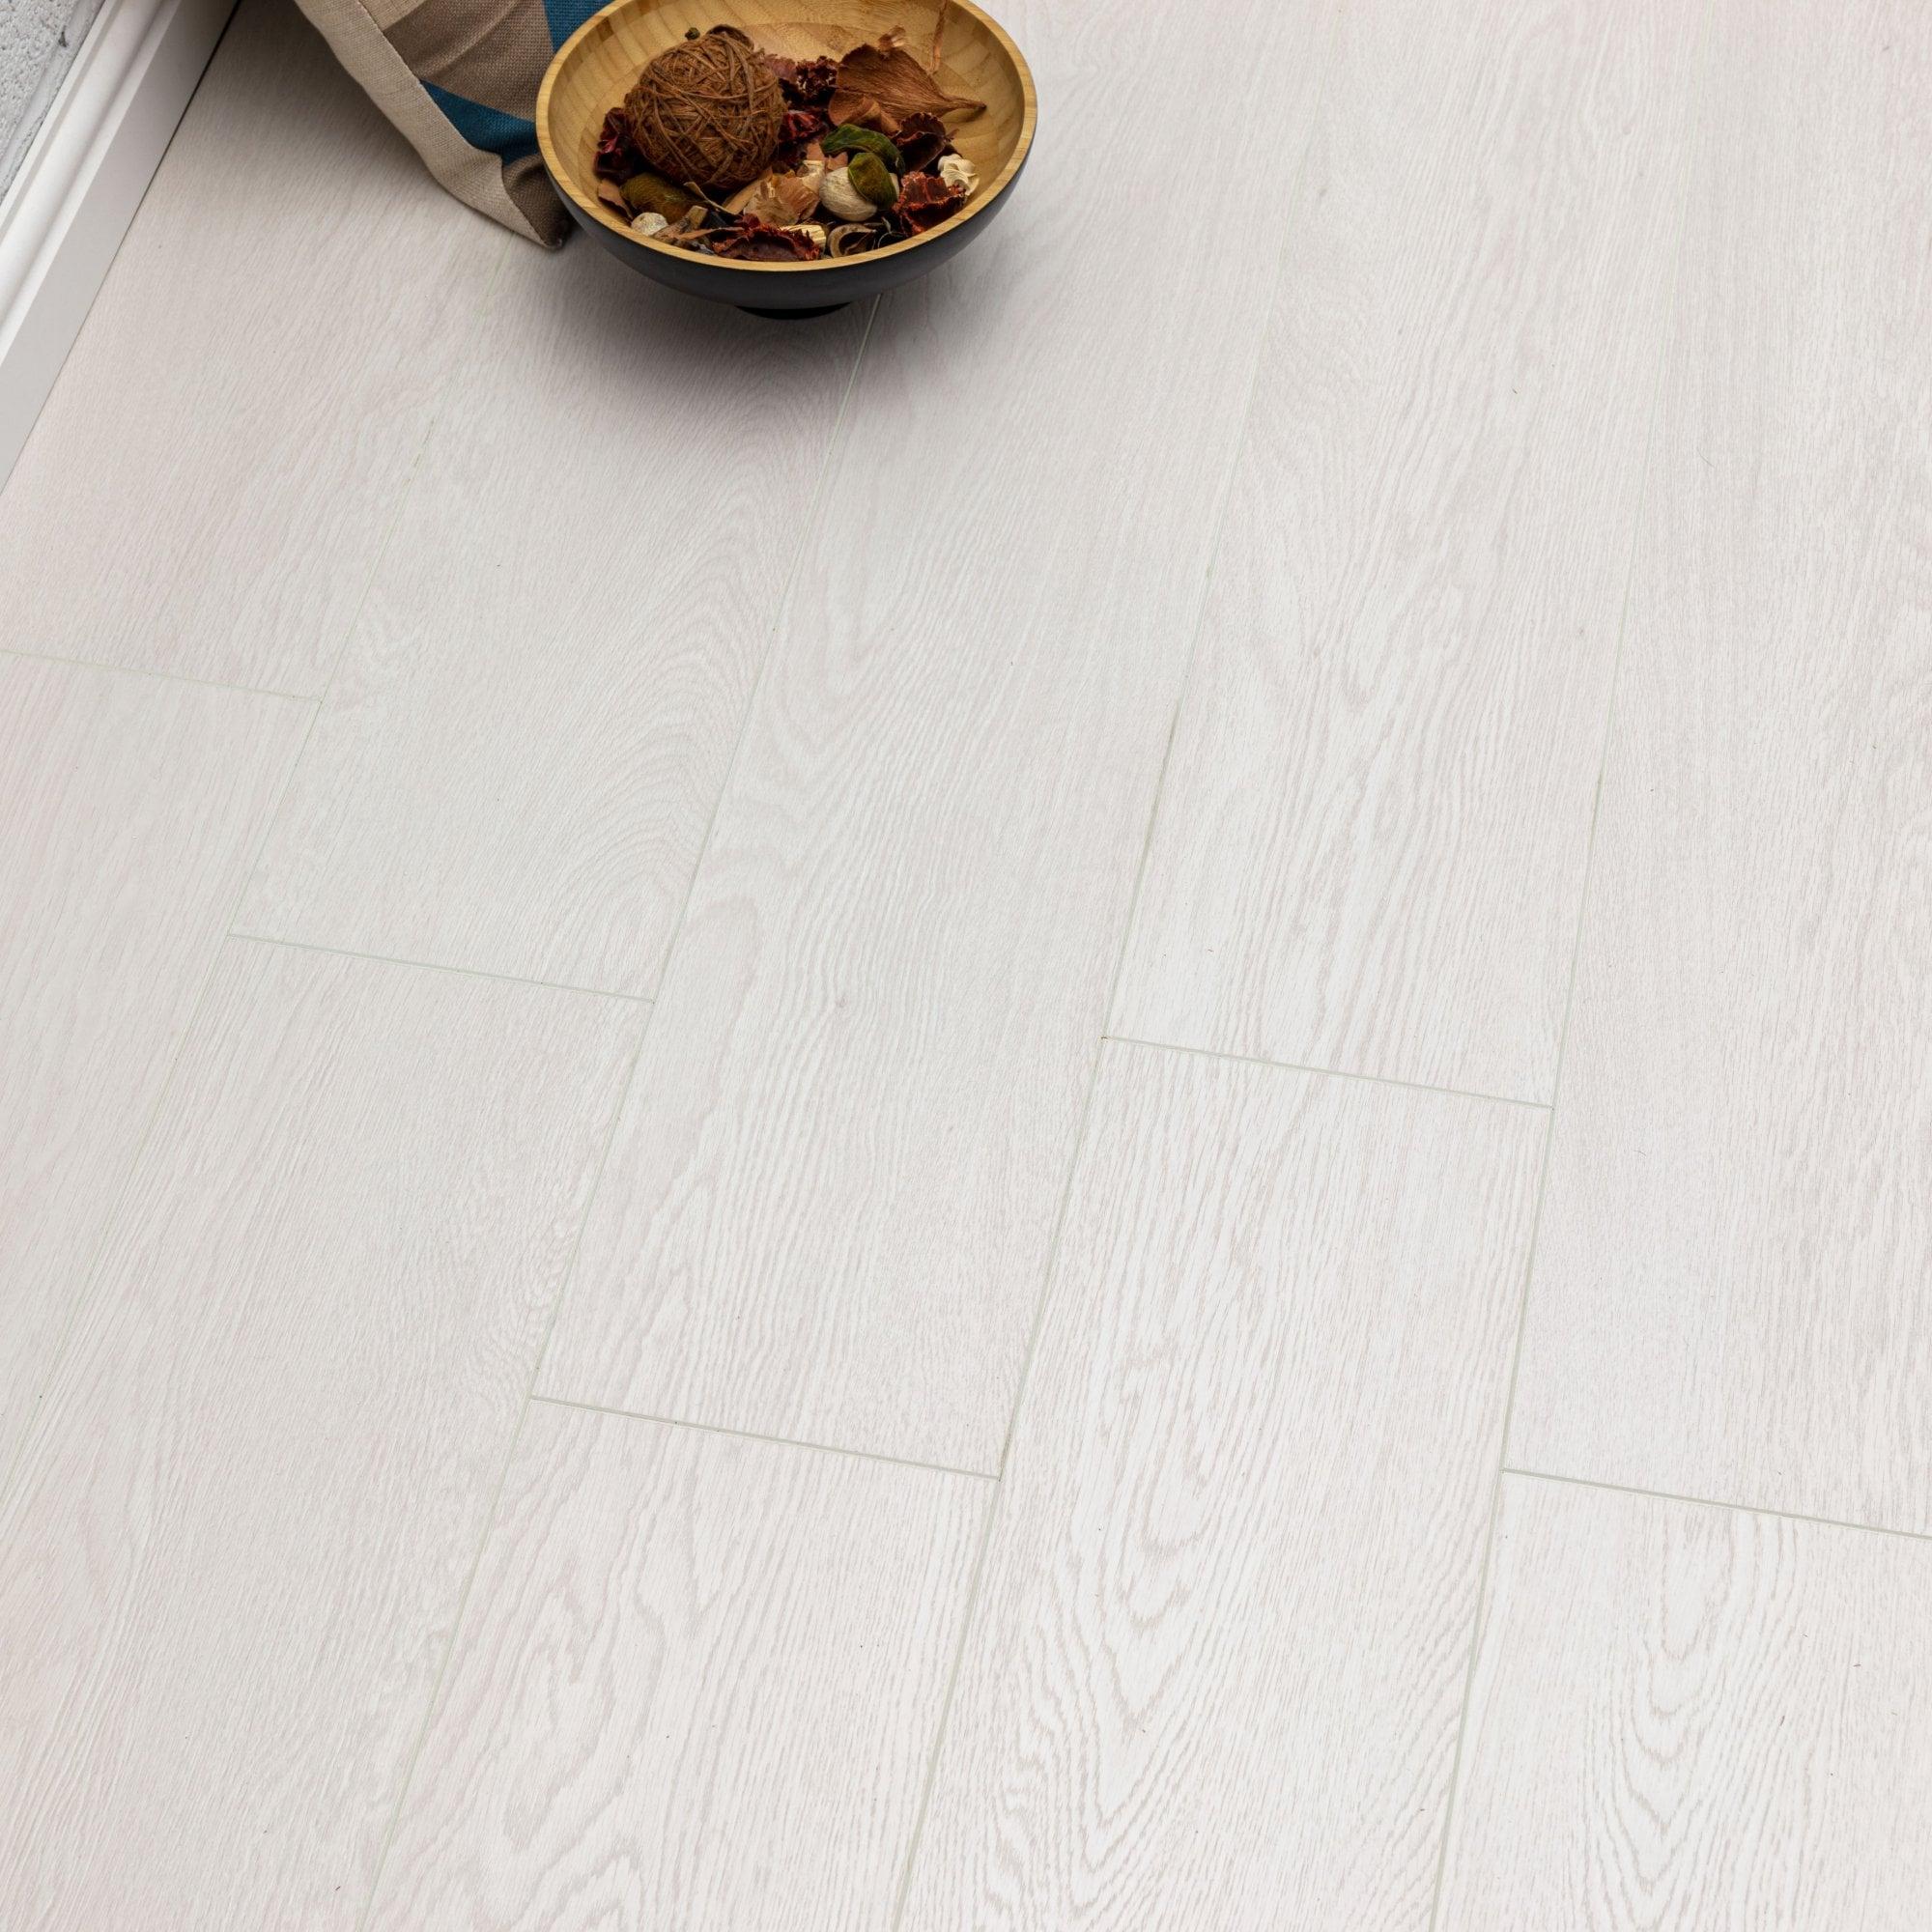 Pelmore Laminate Flooring Echo White, White Wood Look Laminate Flooring